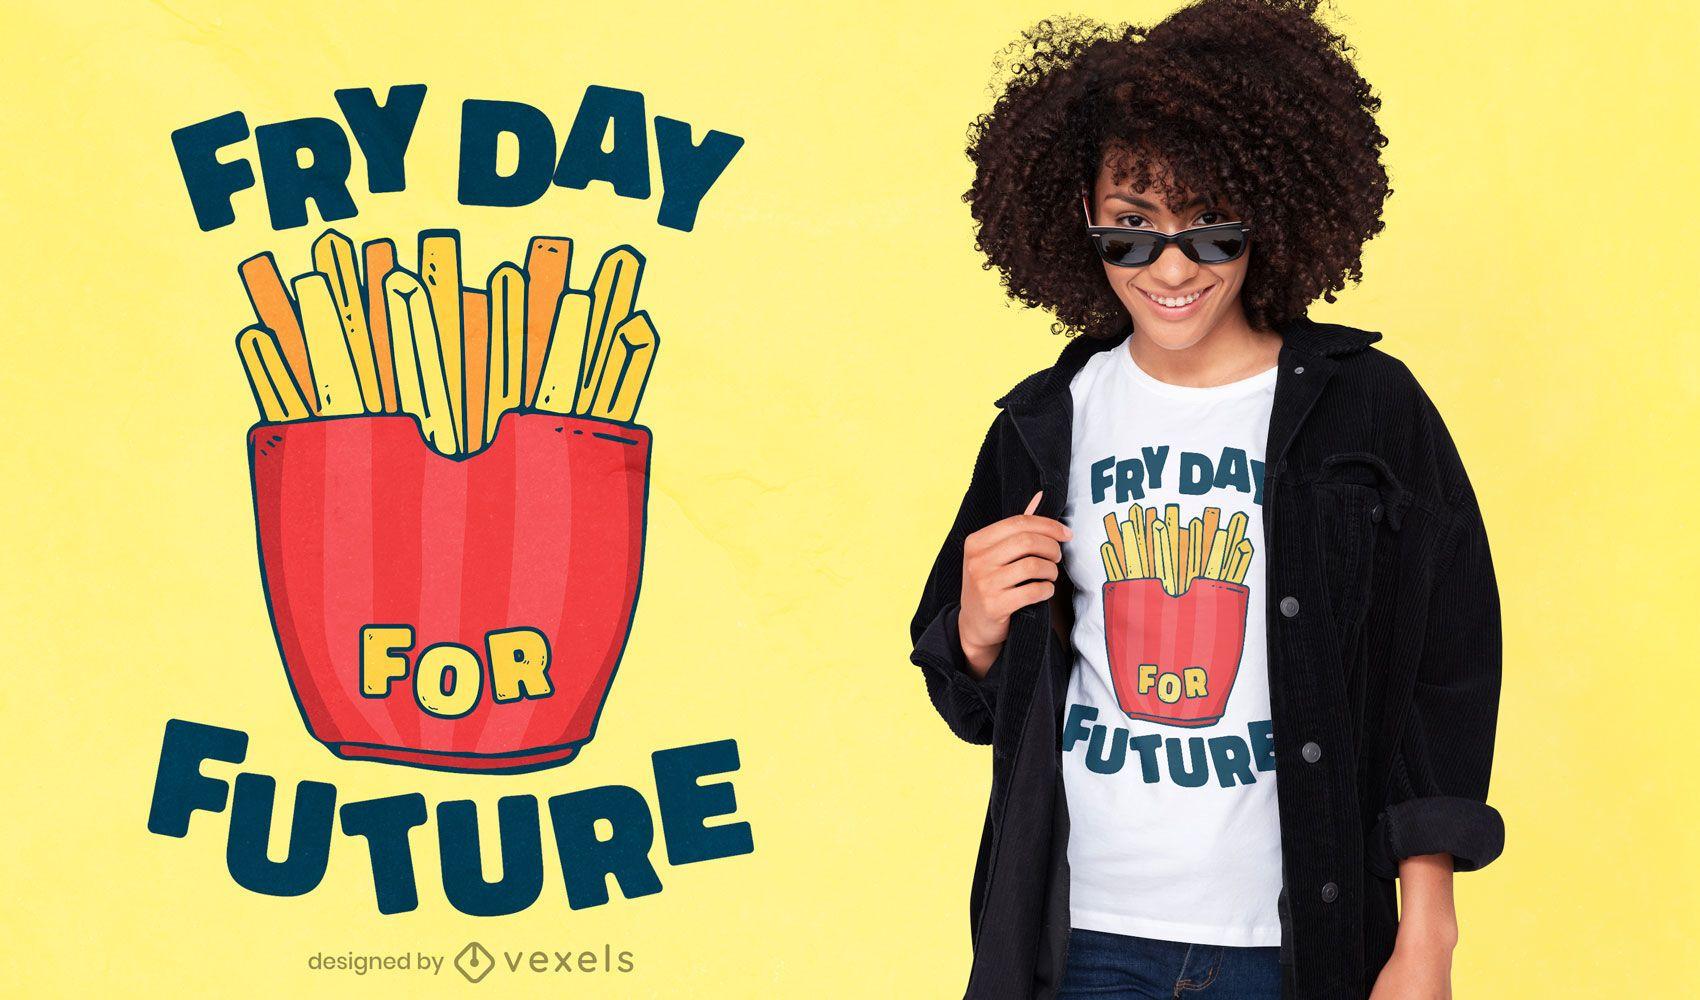 Fry day t-shirt design